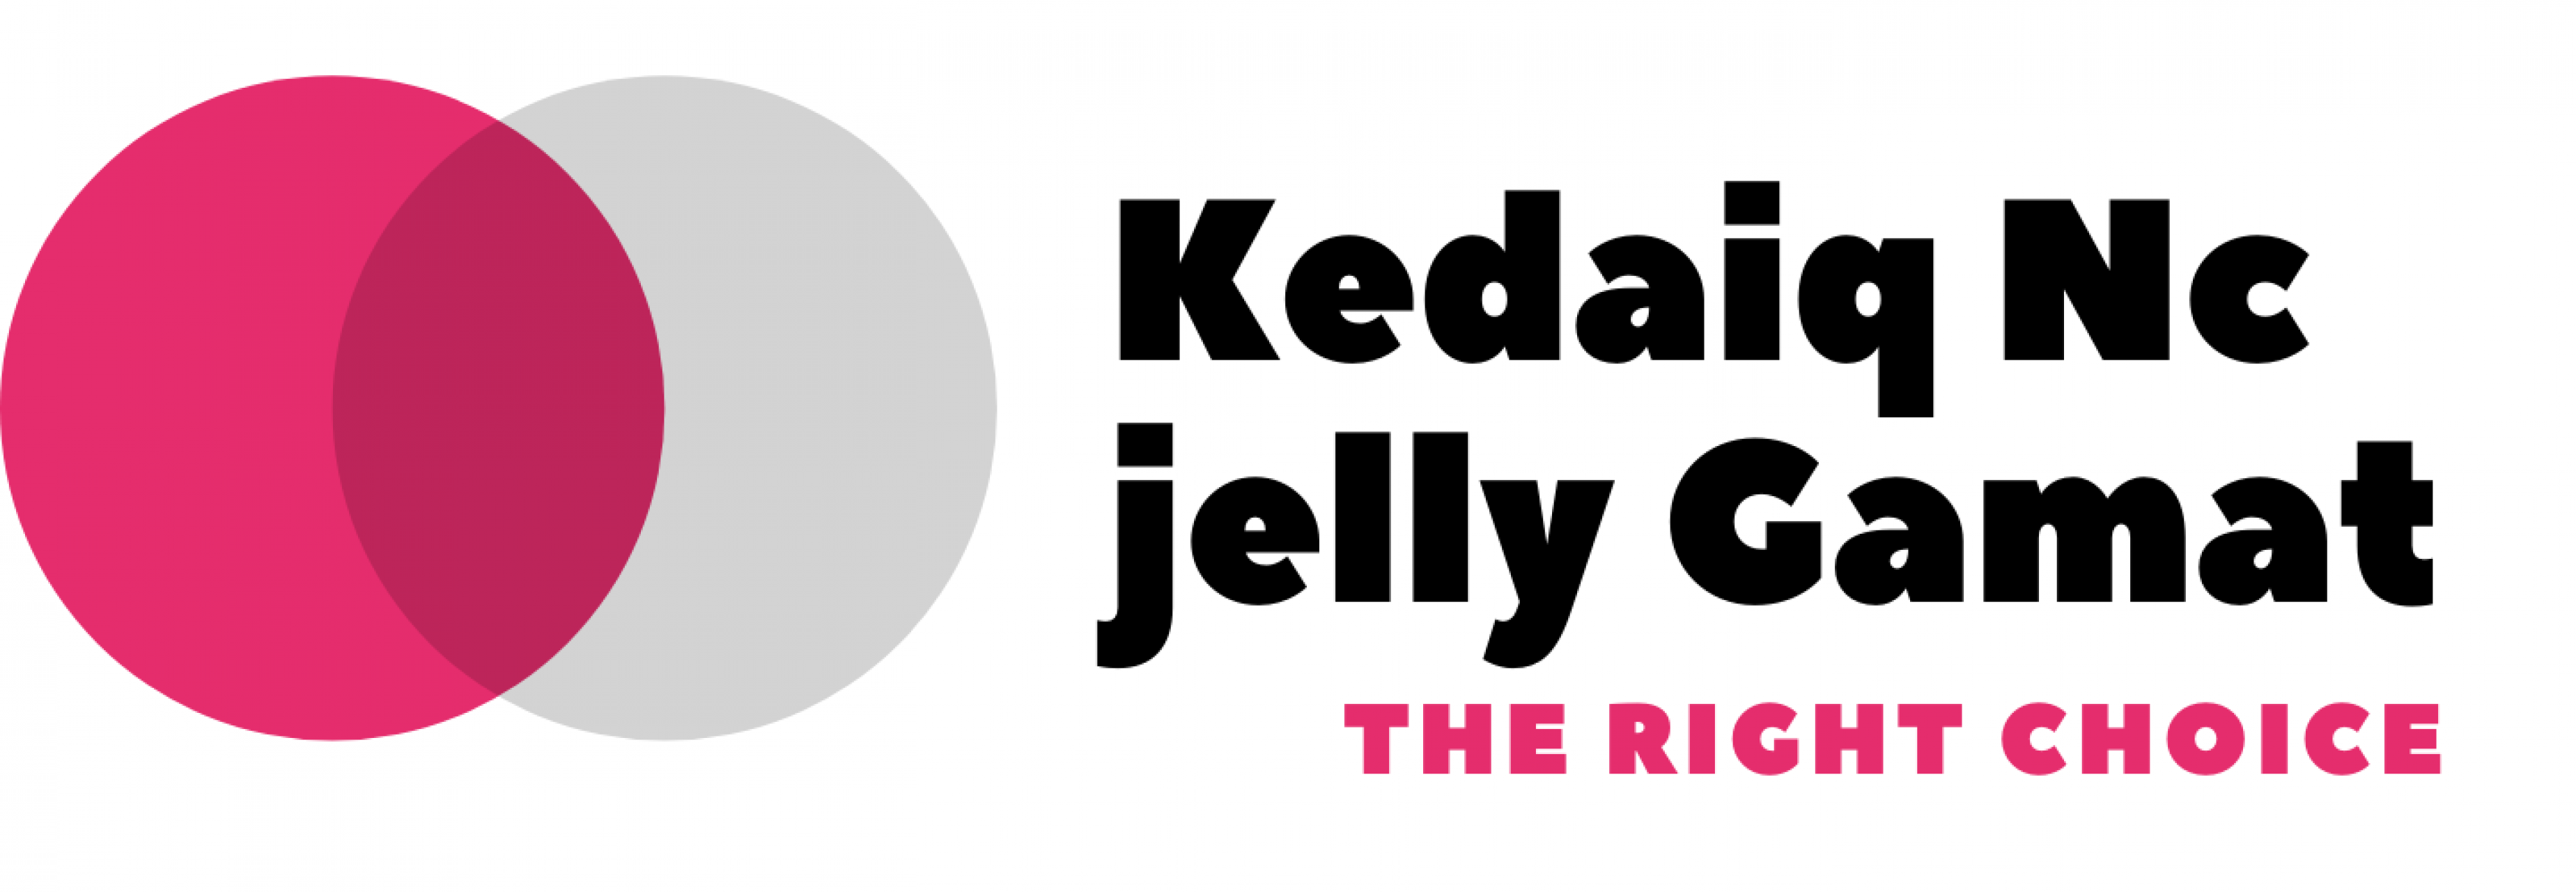 Kedaiq Nc jelly Gamat